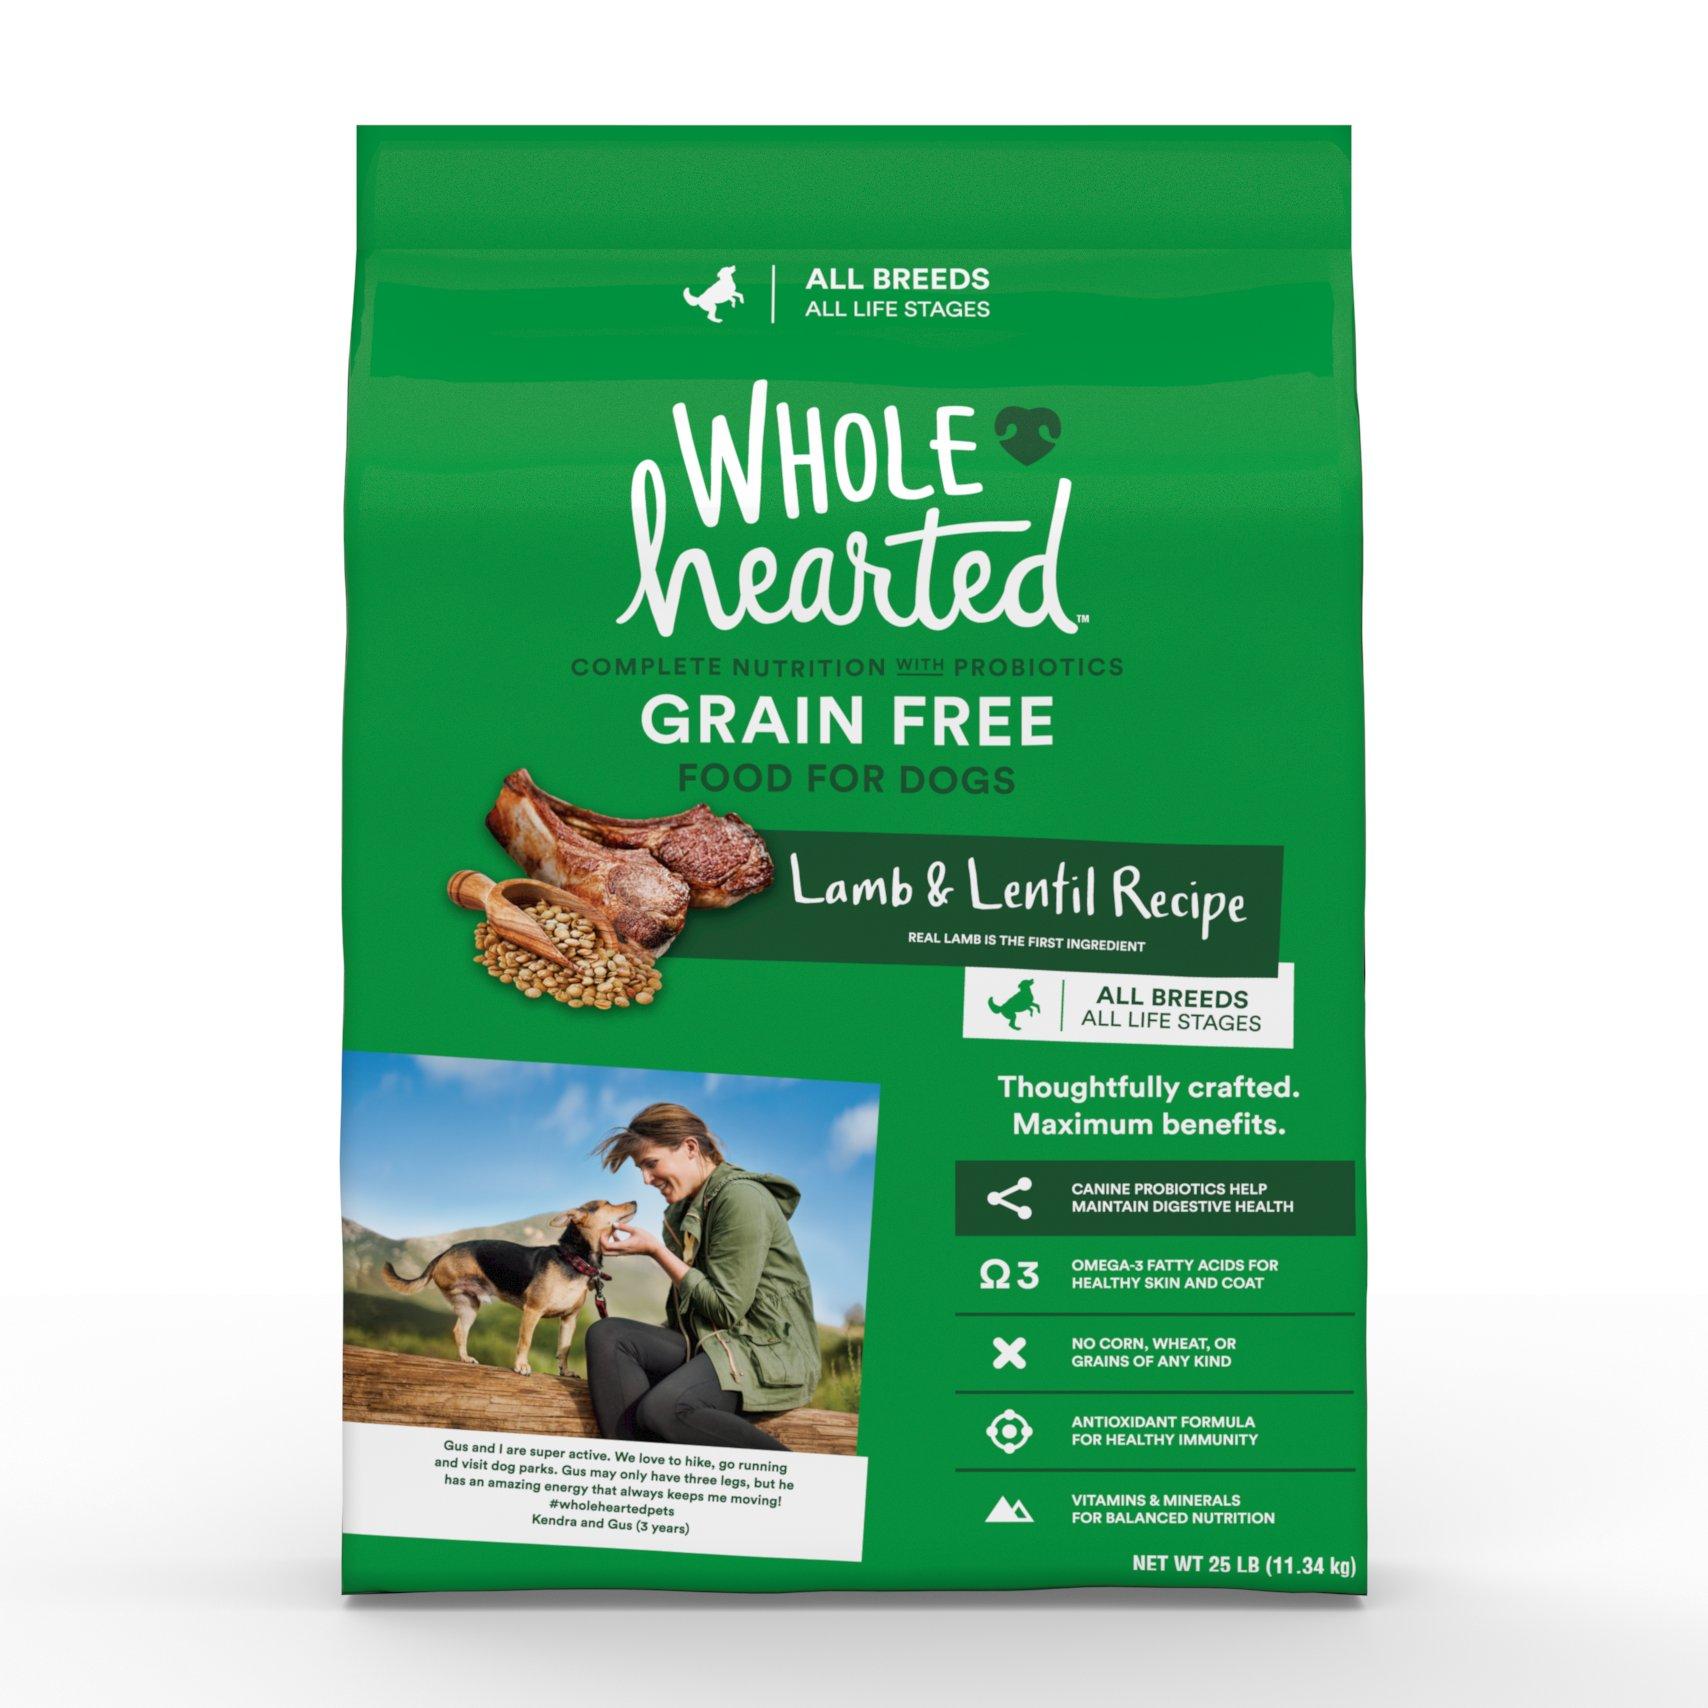 Wholehearted Grain Free Dog Food